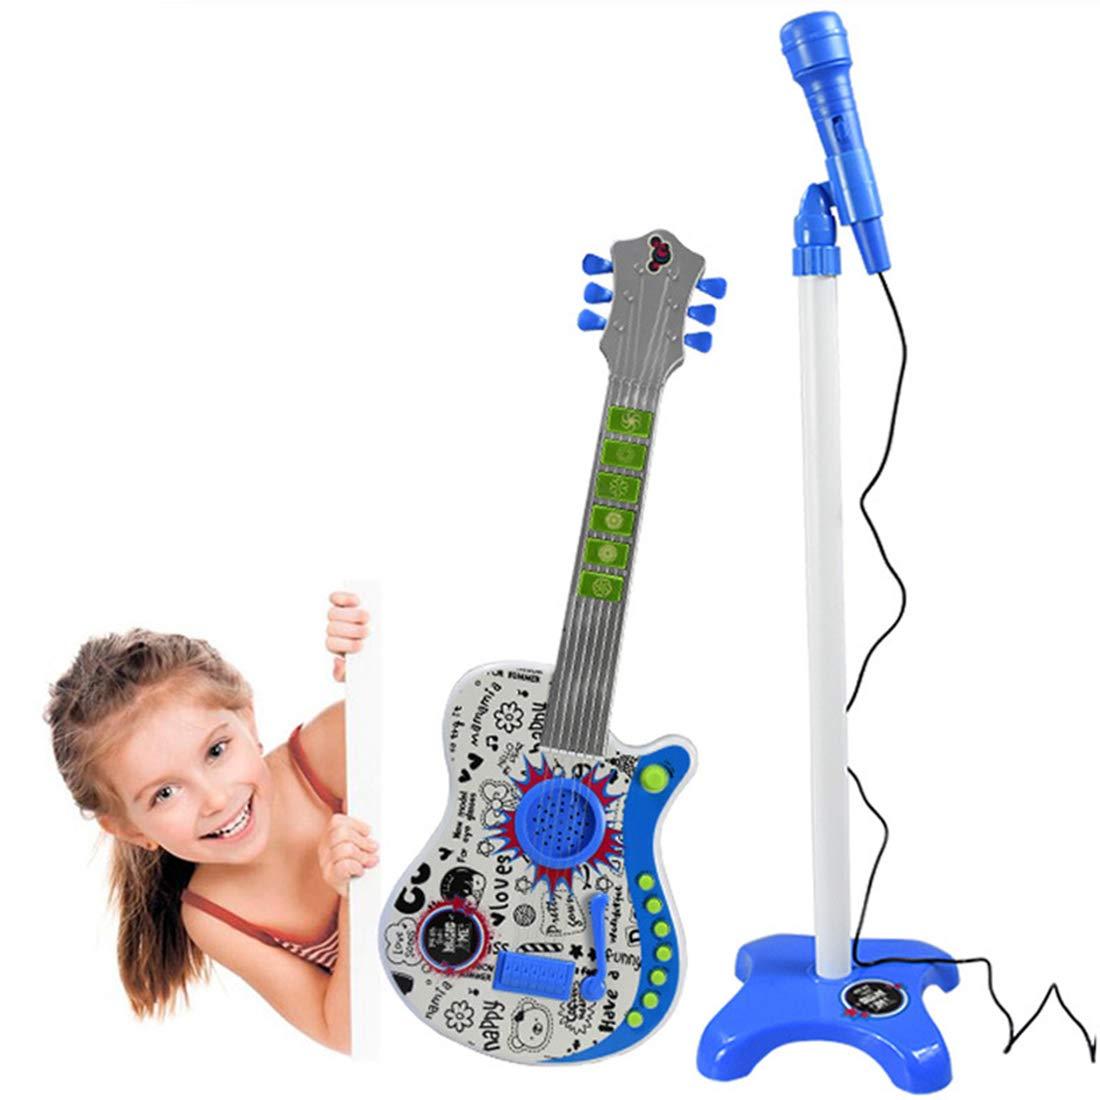 Standmikrofon Kinder Karaoke Kinder Functions Musikinstrumente Spiel f/ür Kinder ab 3 Jahre Blau AMITAS 2-in-1 E-Gitarre Kinder Set